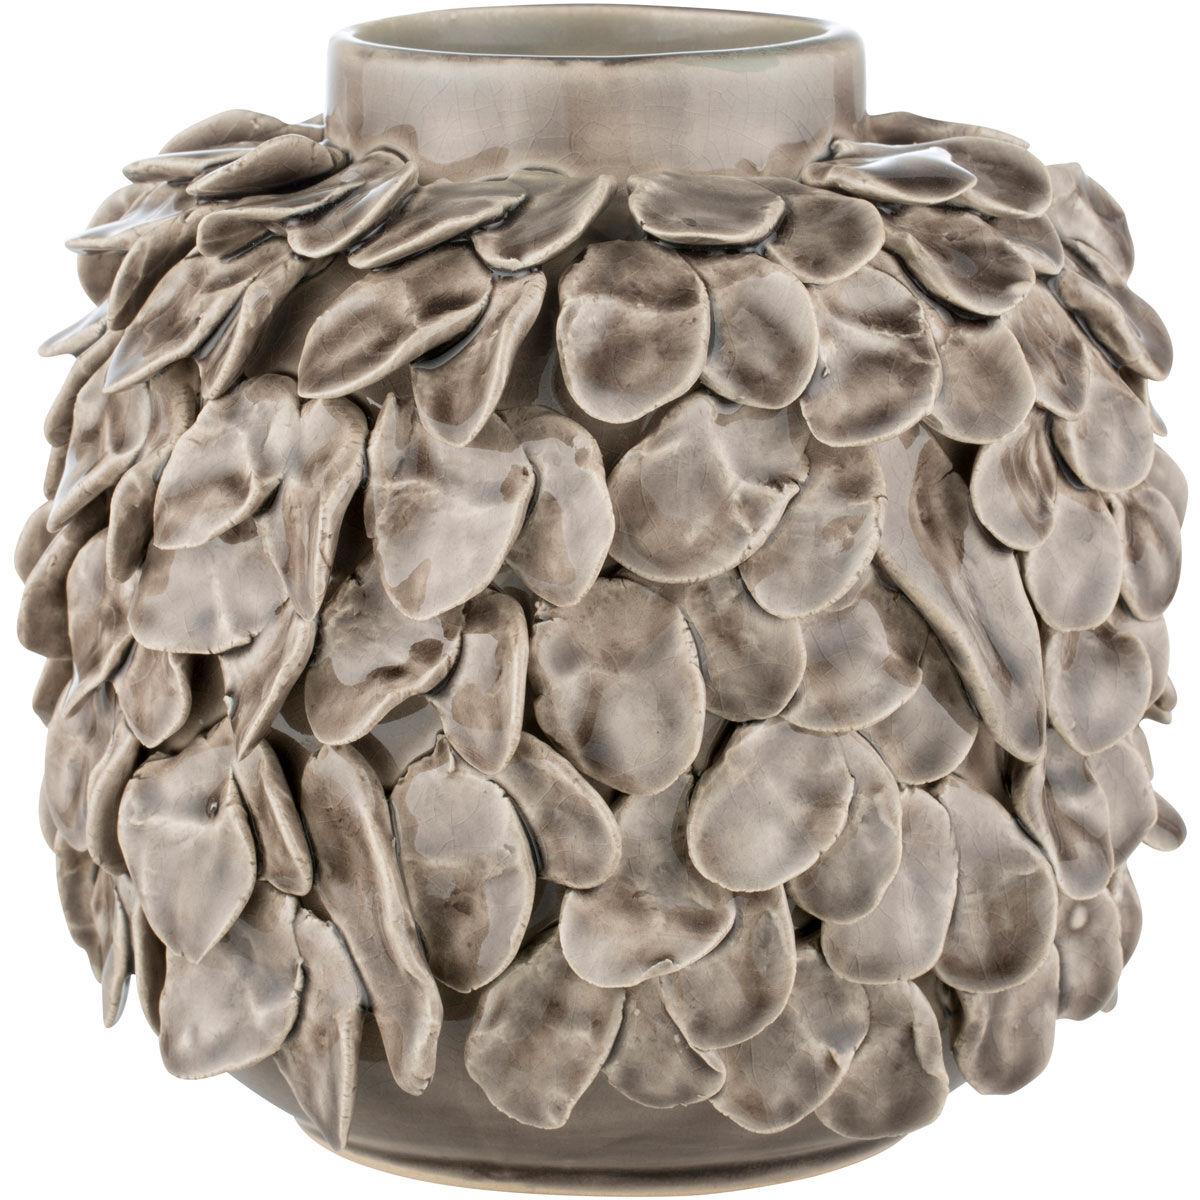 Lene Bjerre Stina Vase 17x16 cm, Driftwood